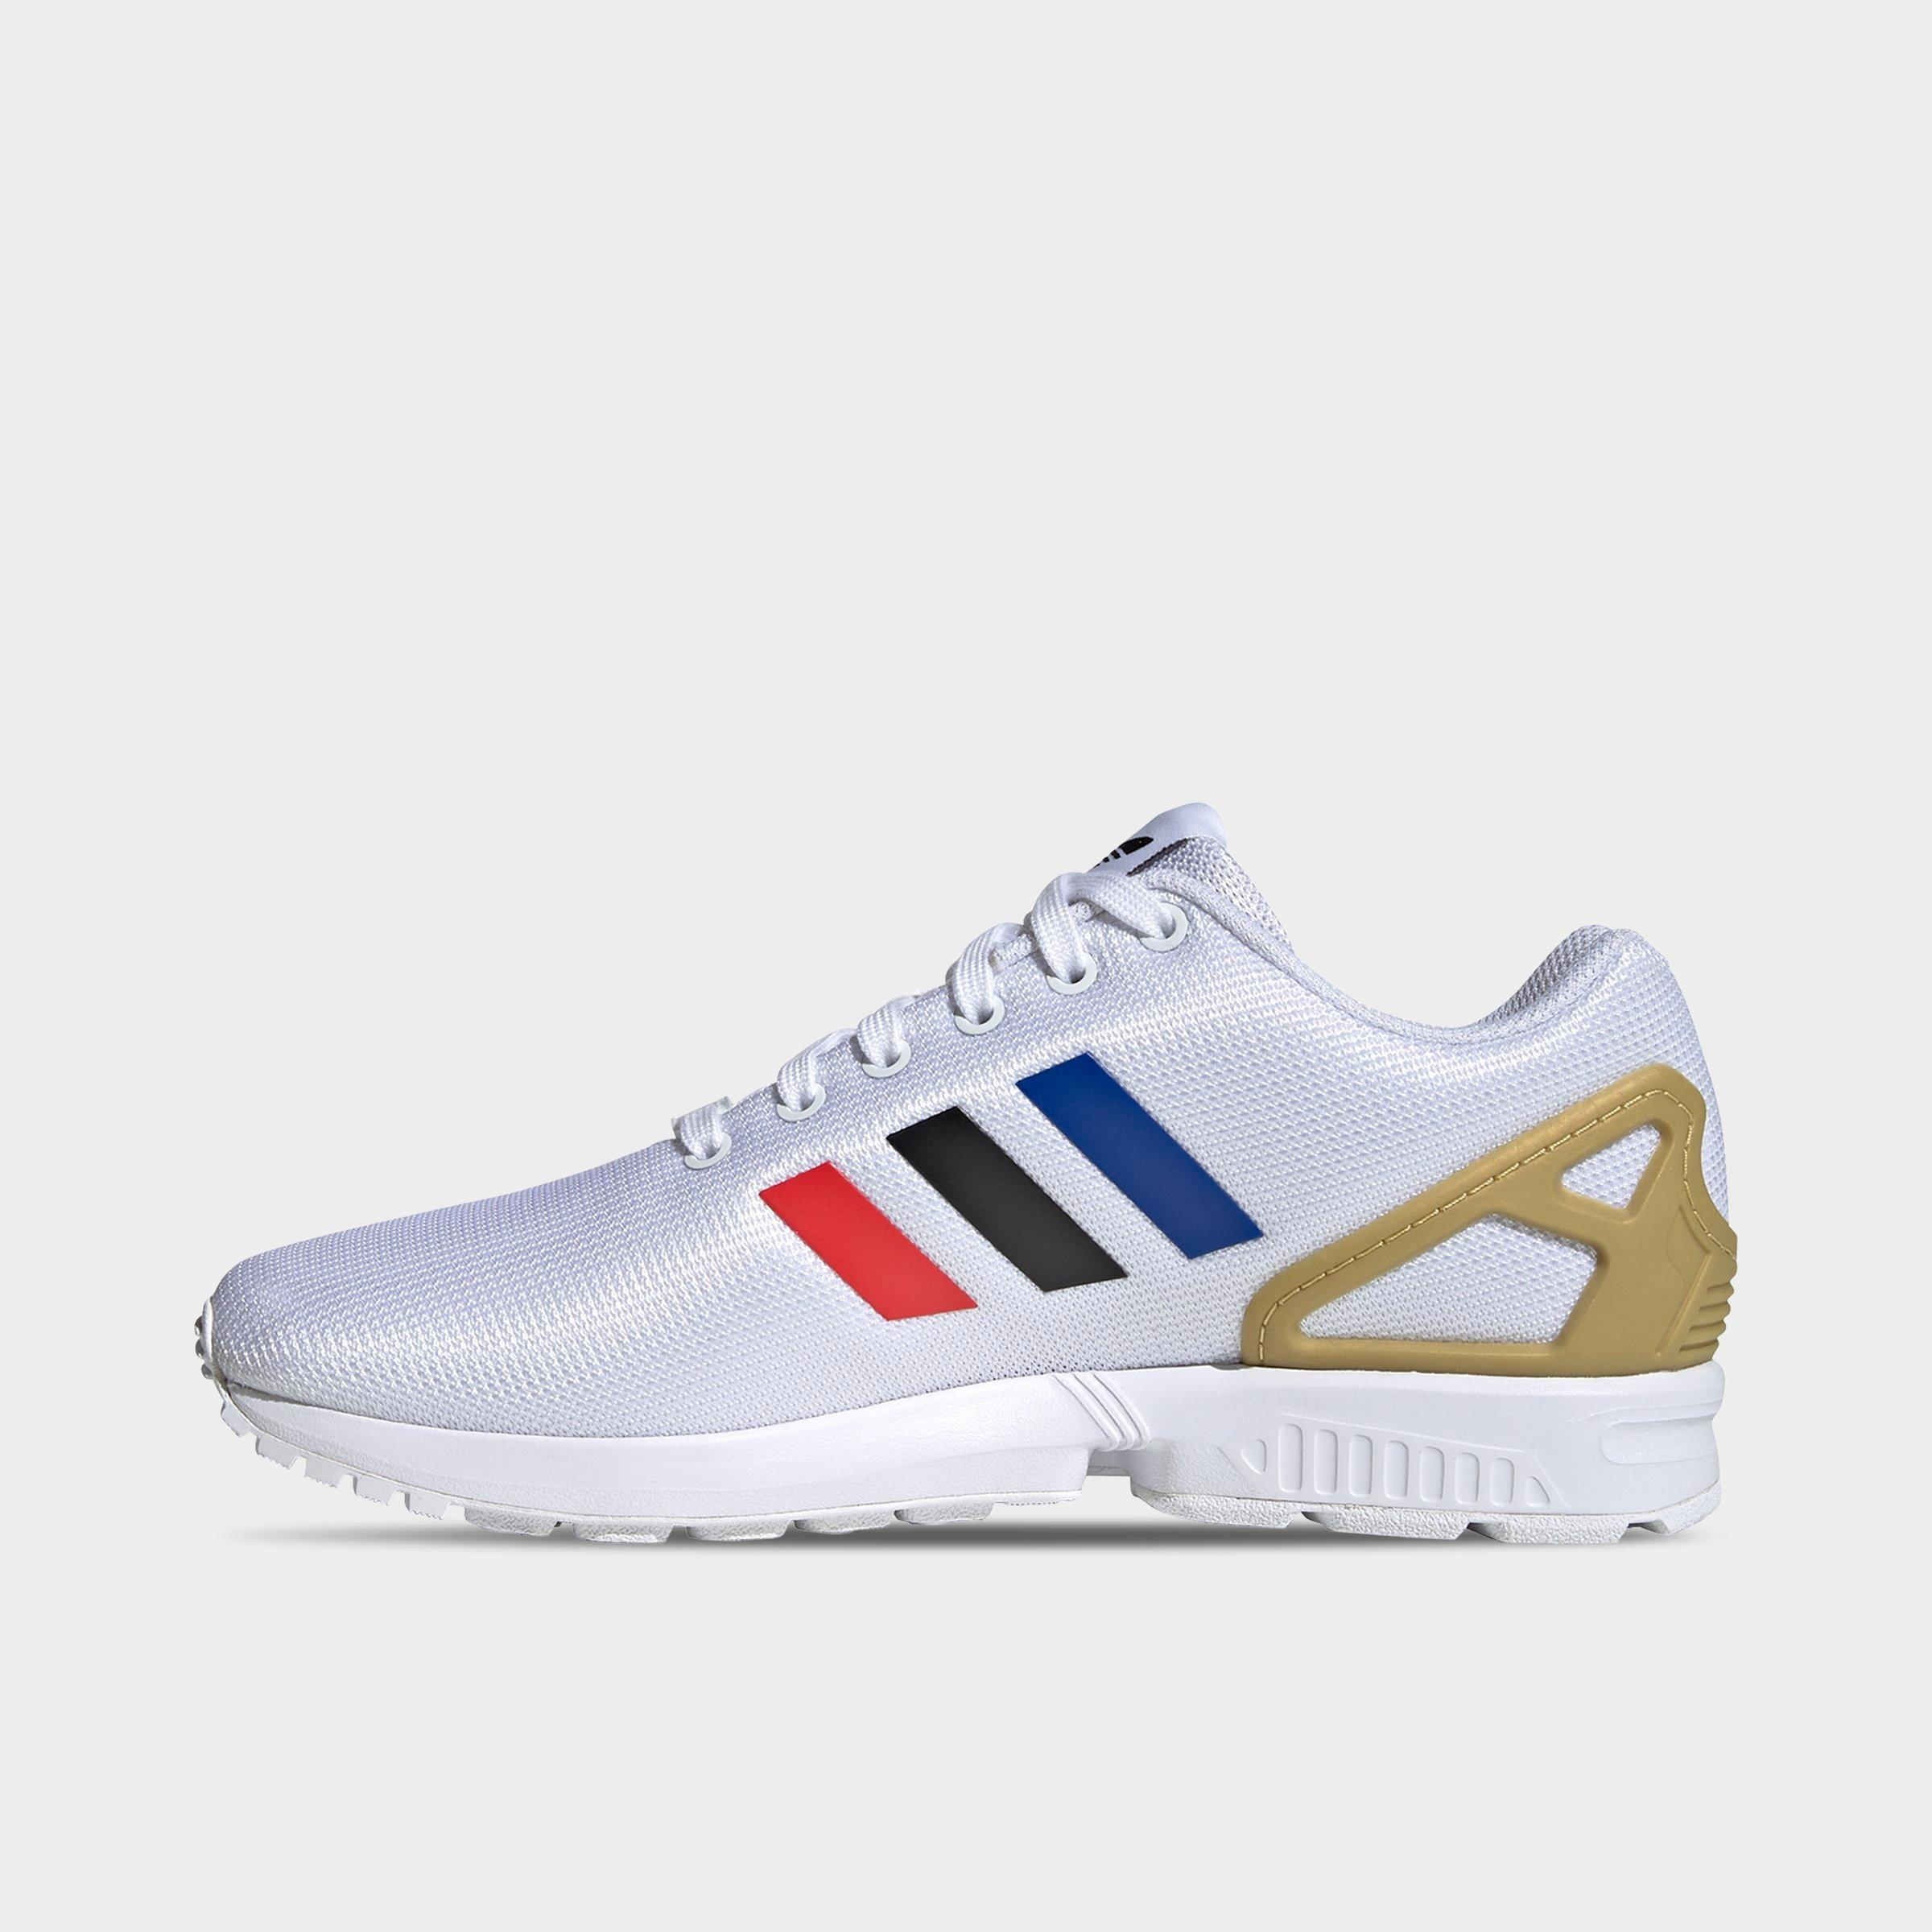 zx flux adidas buy